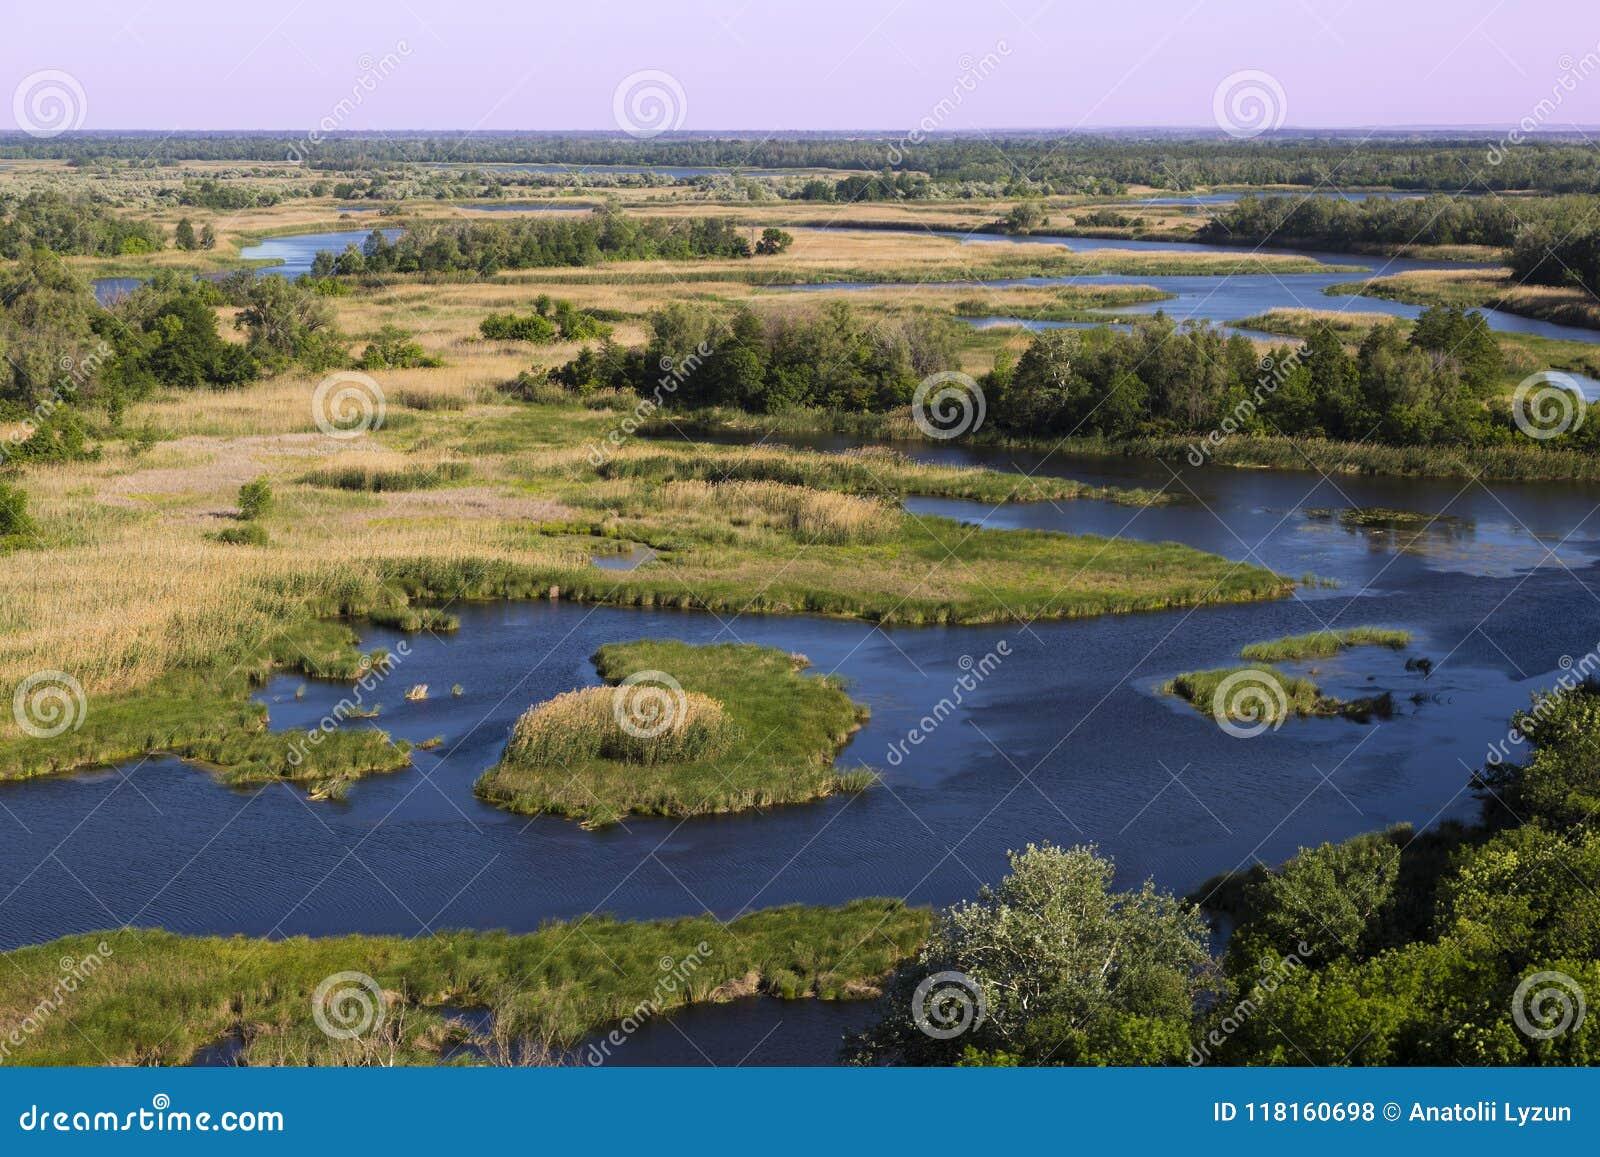 Bottom land of Vorskla river . Top view. Ukraine. Europe